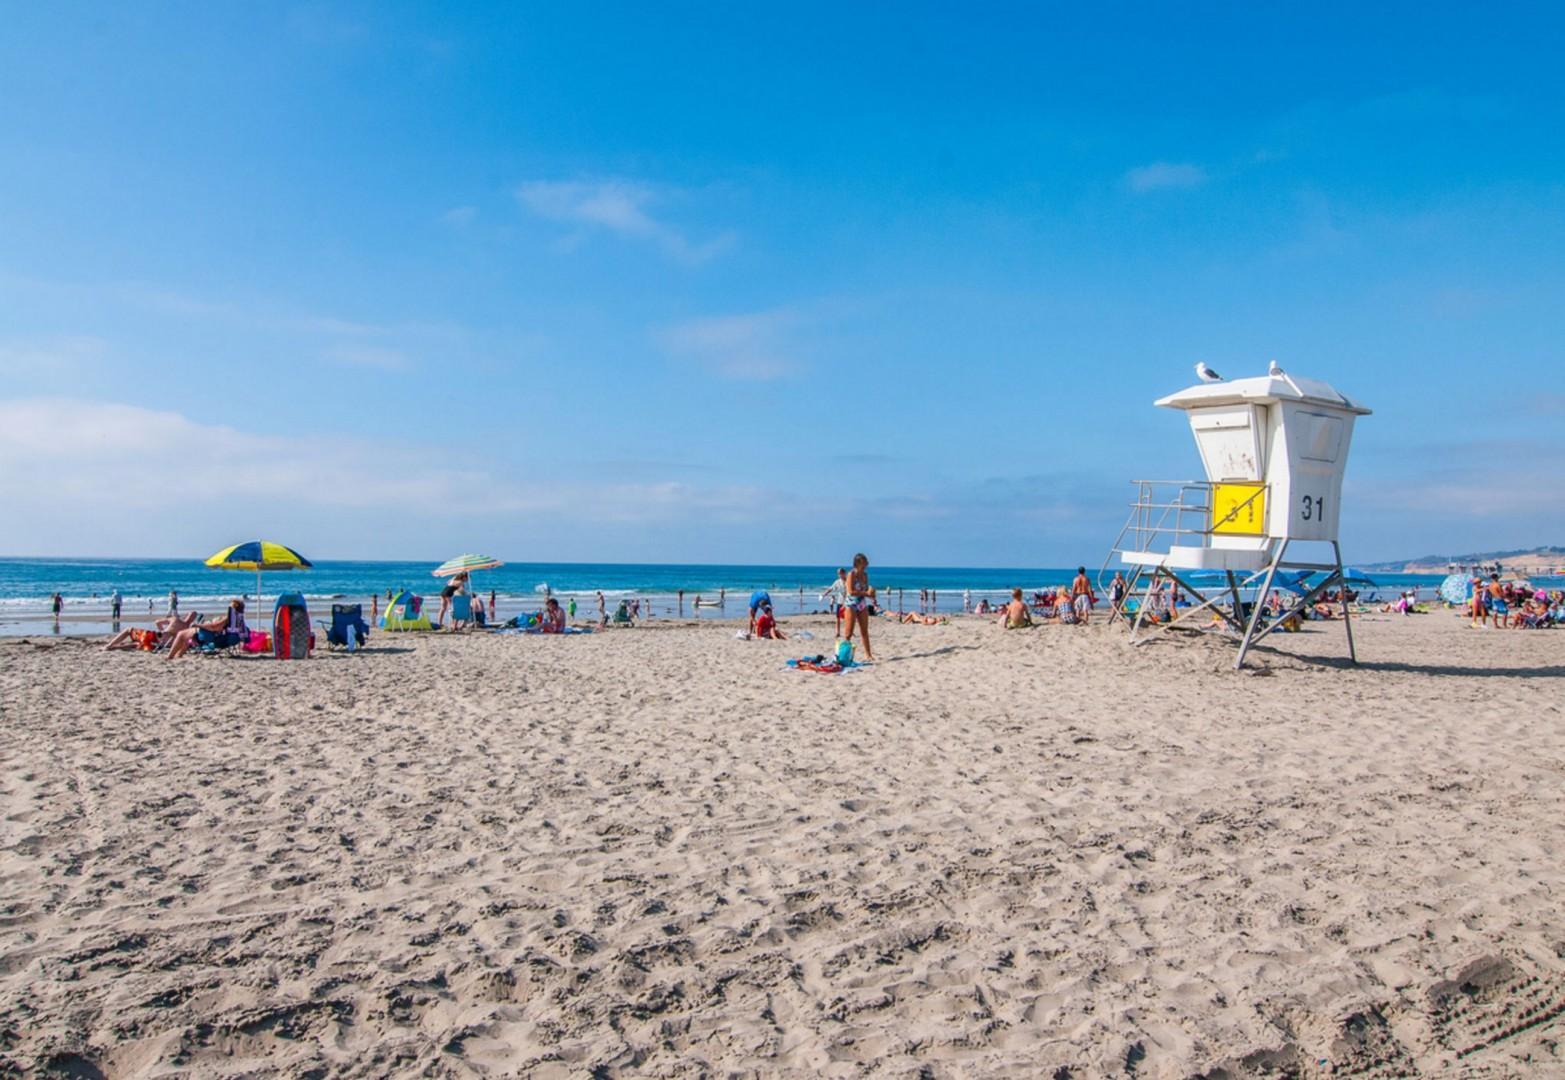 La-Jolla-Shores-Beach